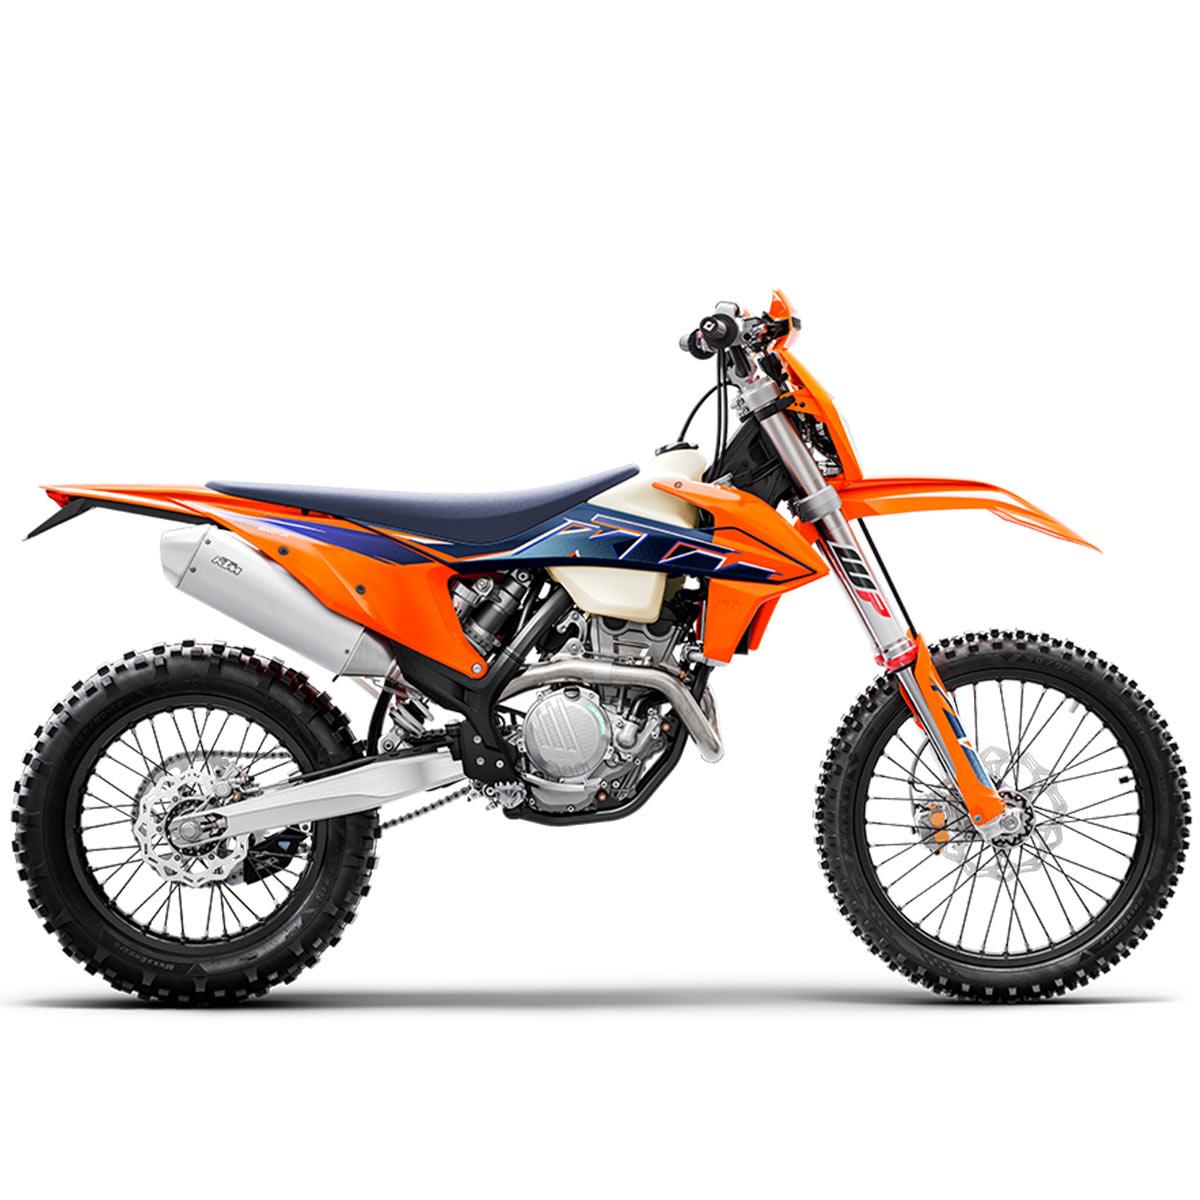 KTM-250-EXC-F